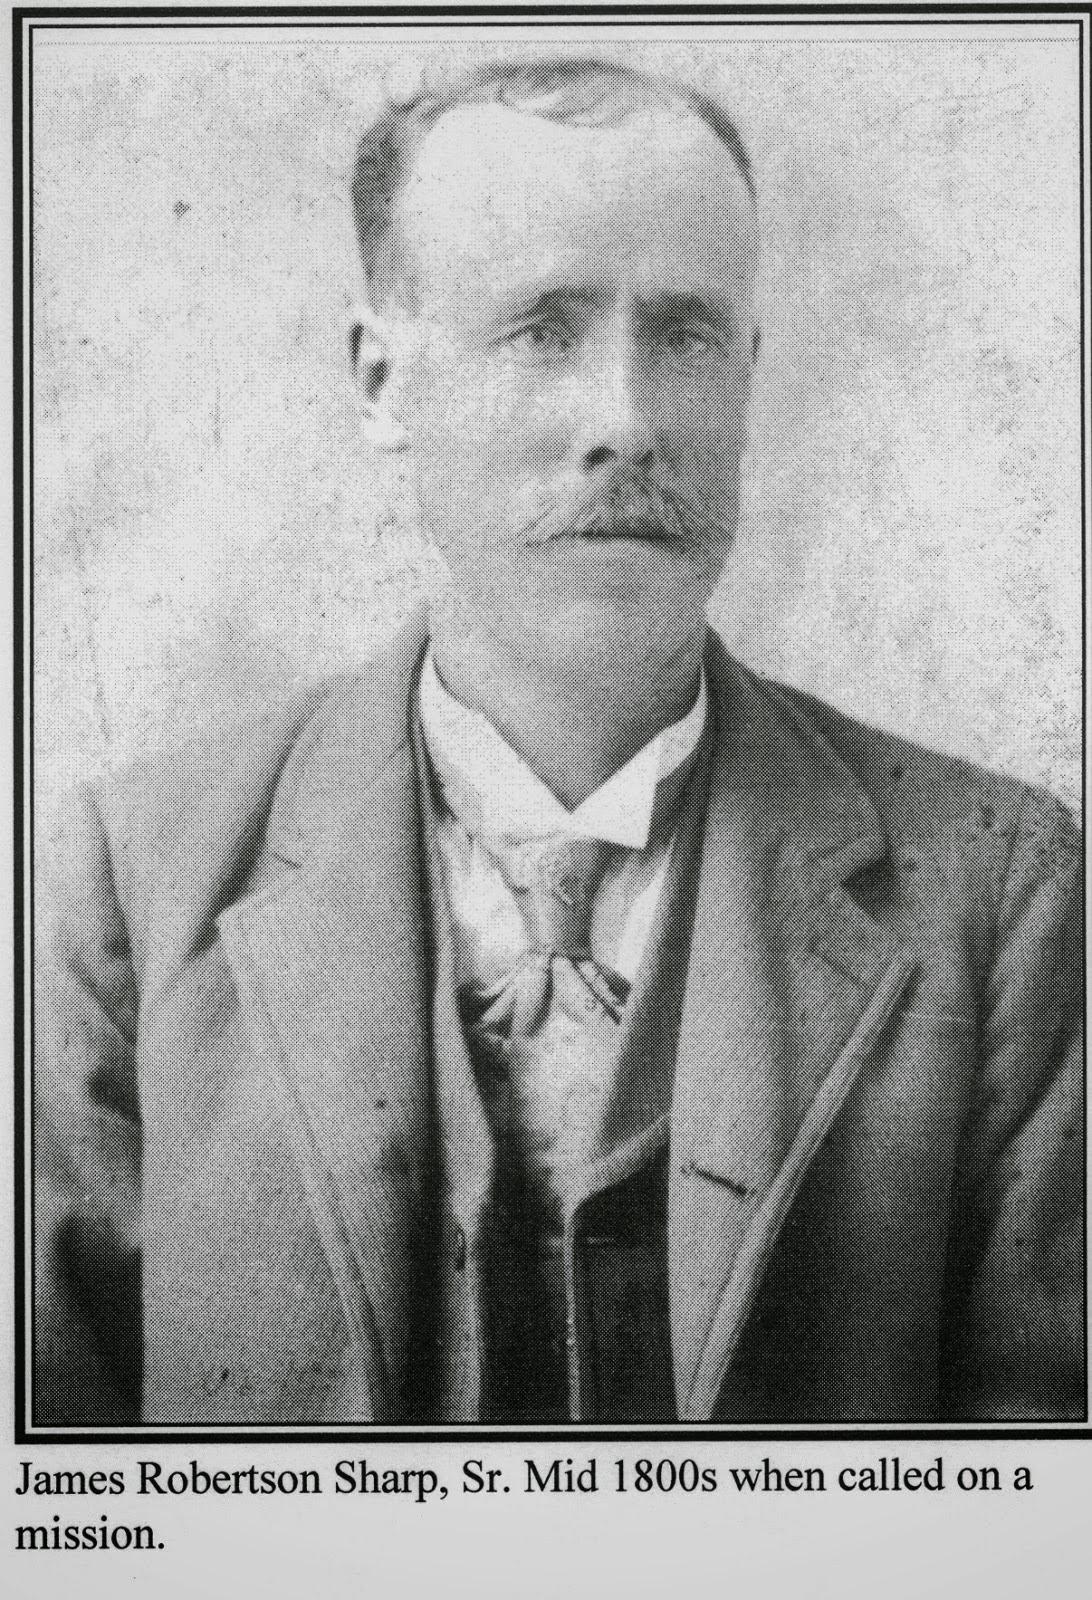 James Robertson Sharp